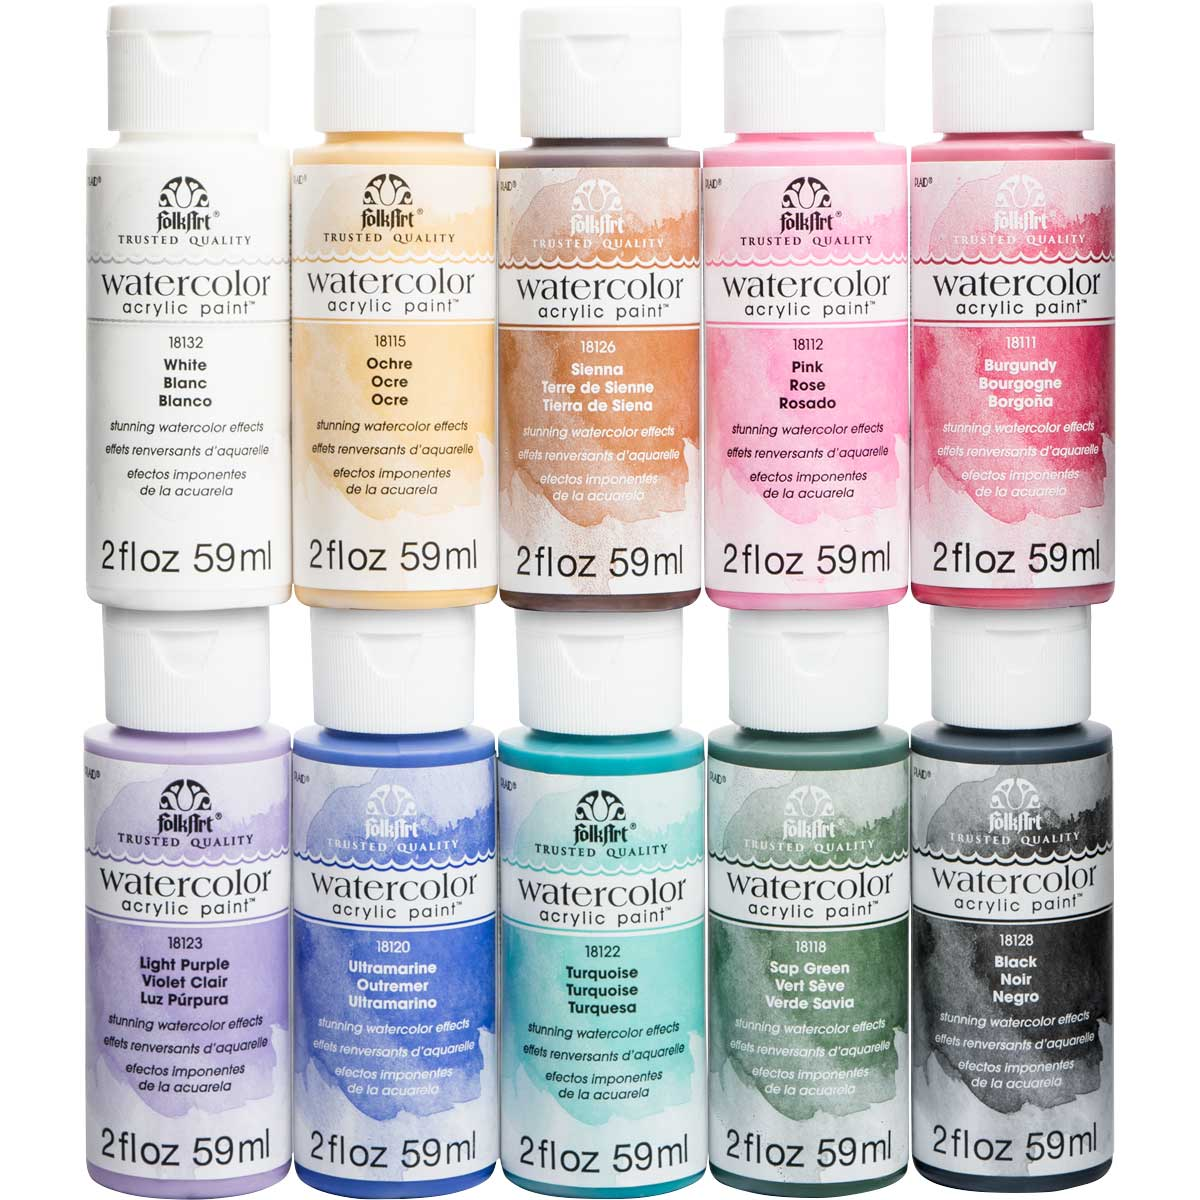 FolkArt ® Watercolor Acrylic Paint™ 10 Color Set - PROMOFAWC10